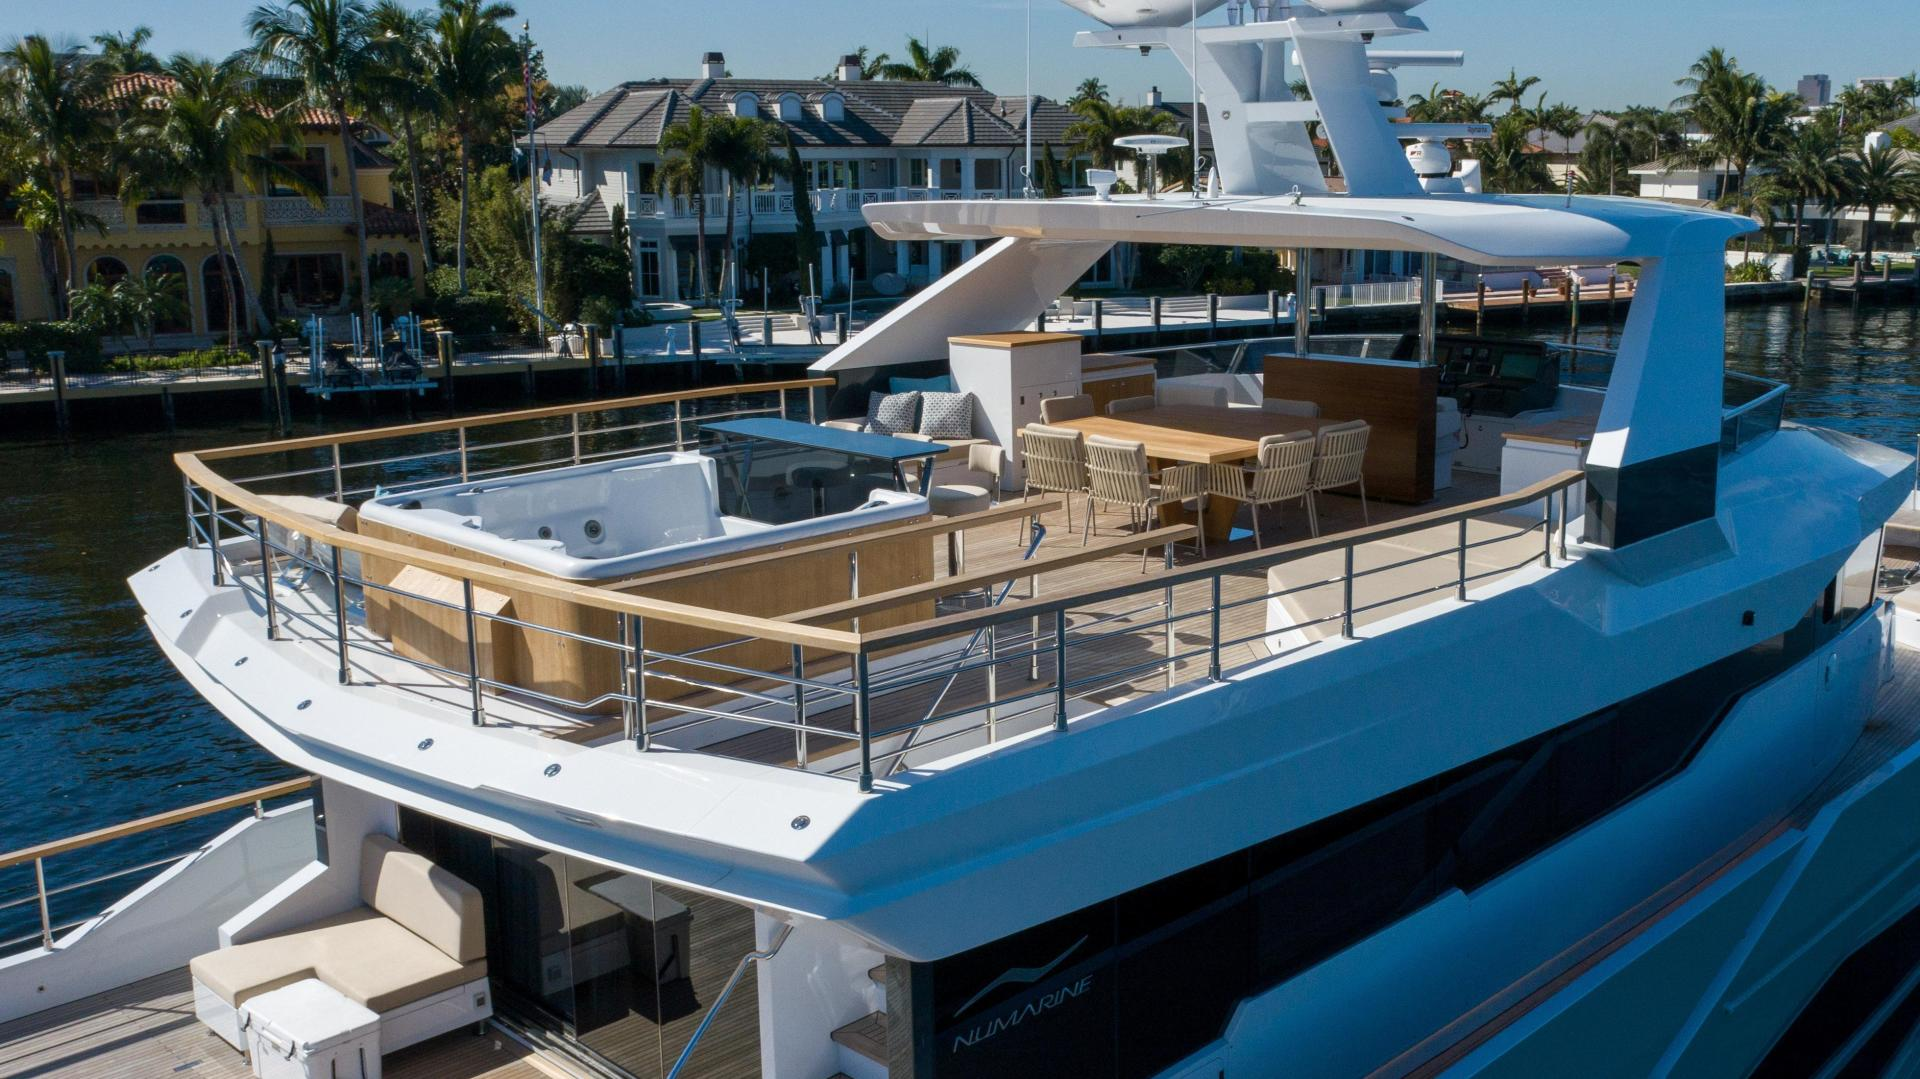 Numarine-32XP 2020-7 Diamonds Fort Lauderdale-Florida-United States-1629375 | Thumbnail